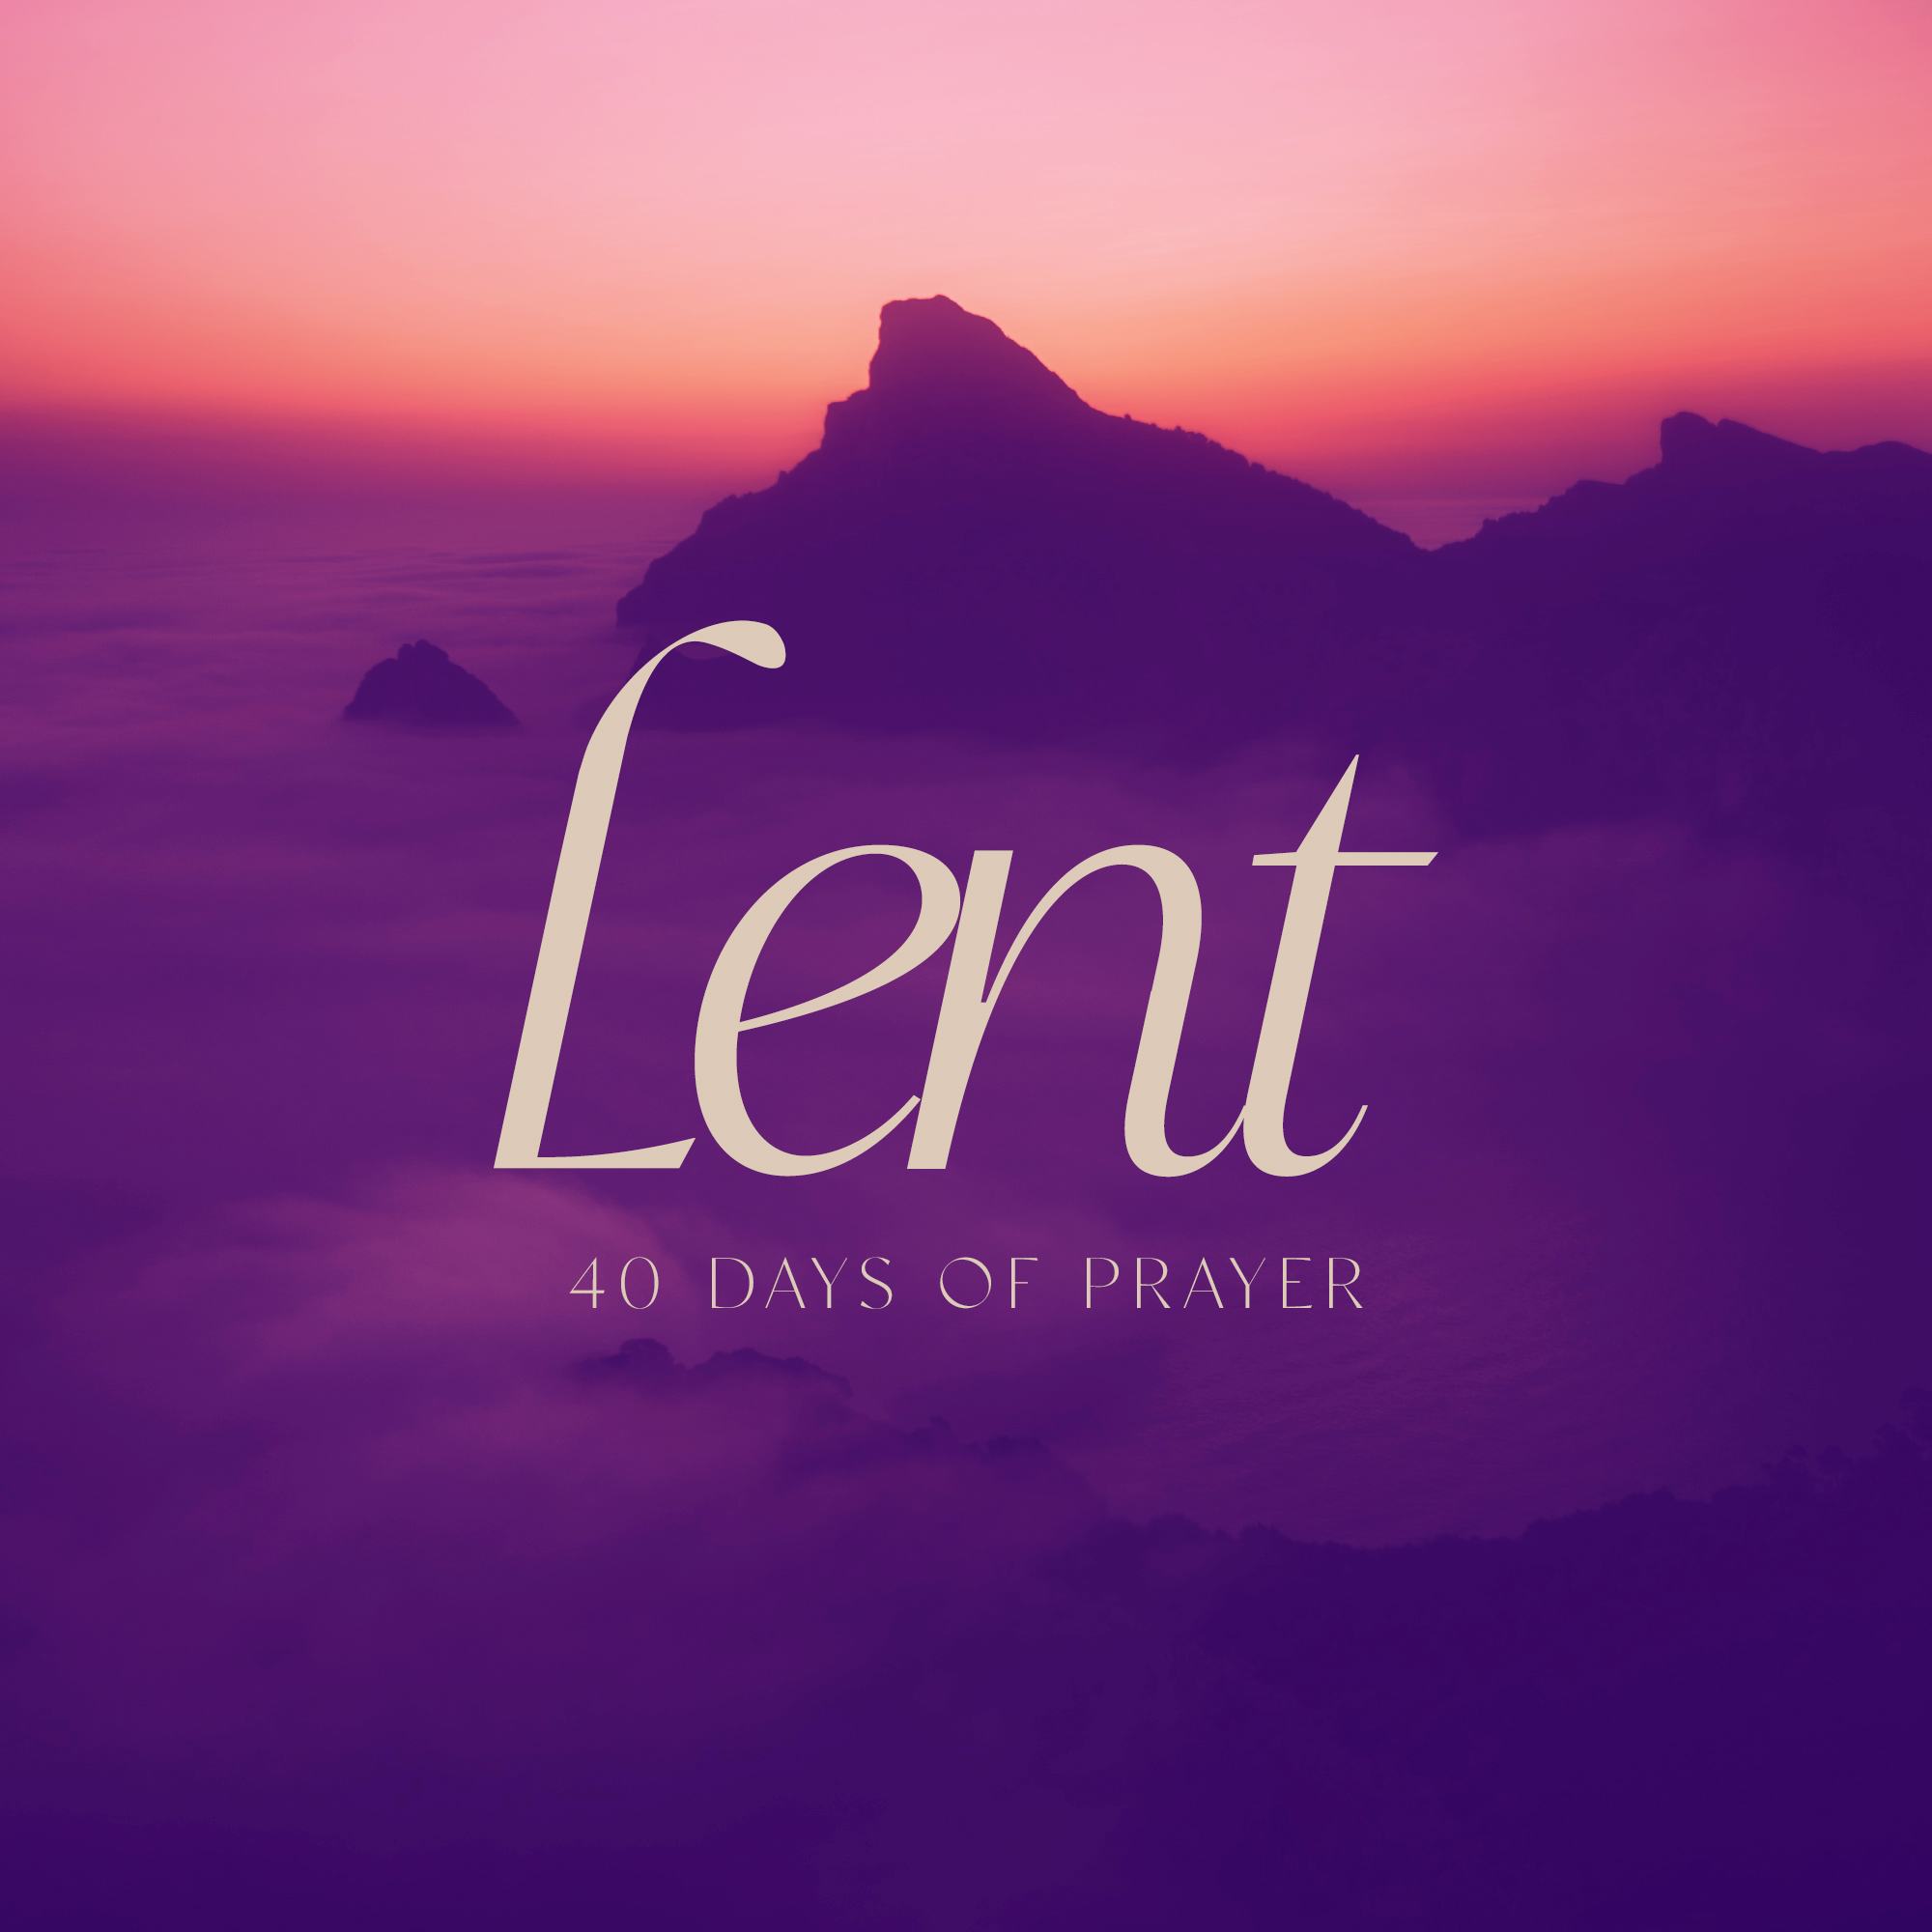 Daily Lenten Devotions